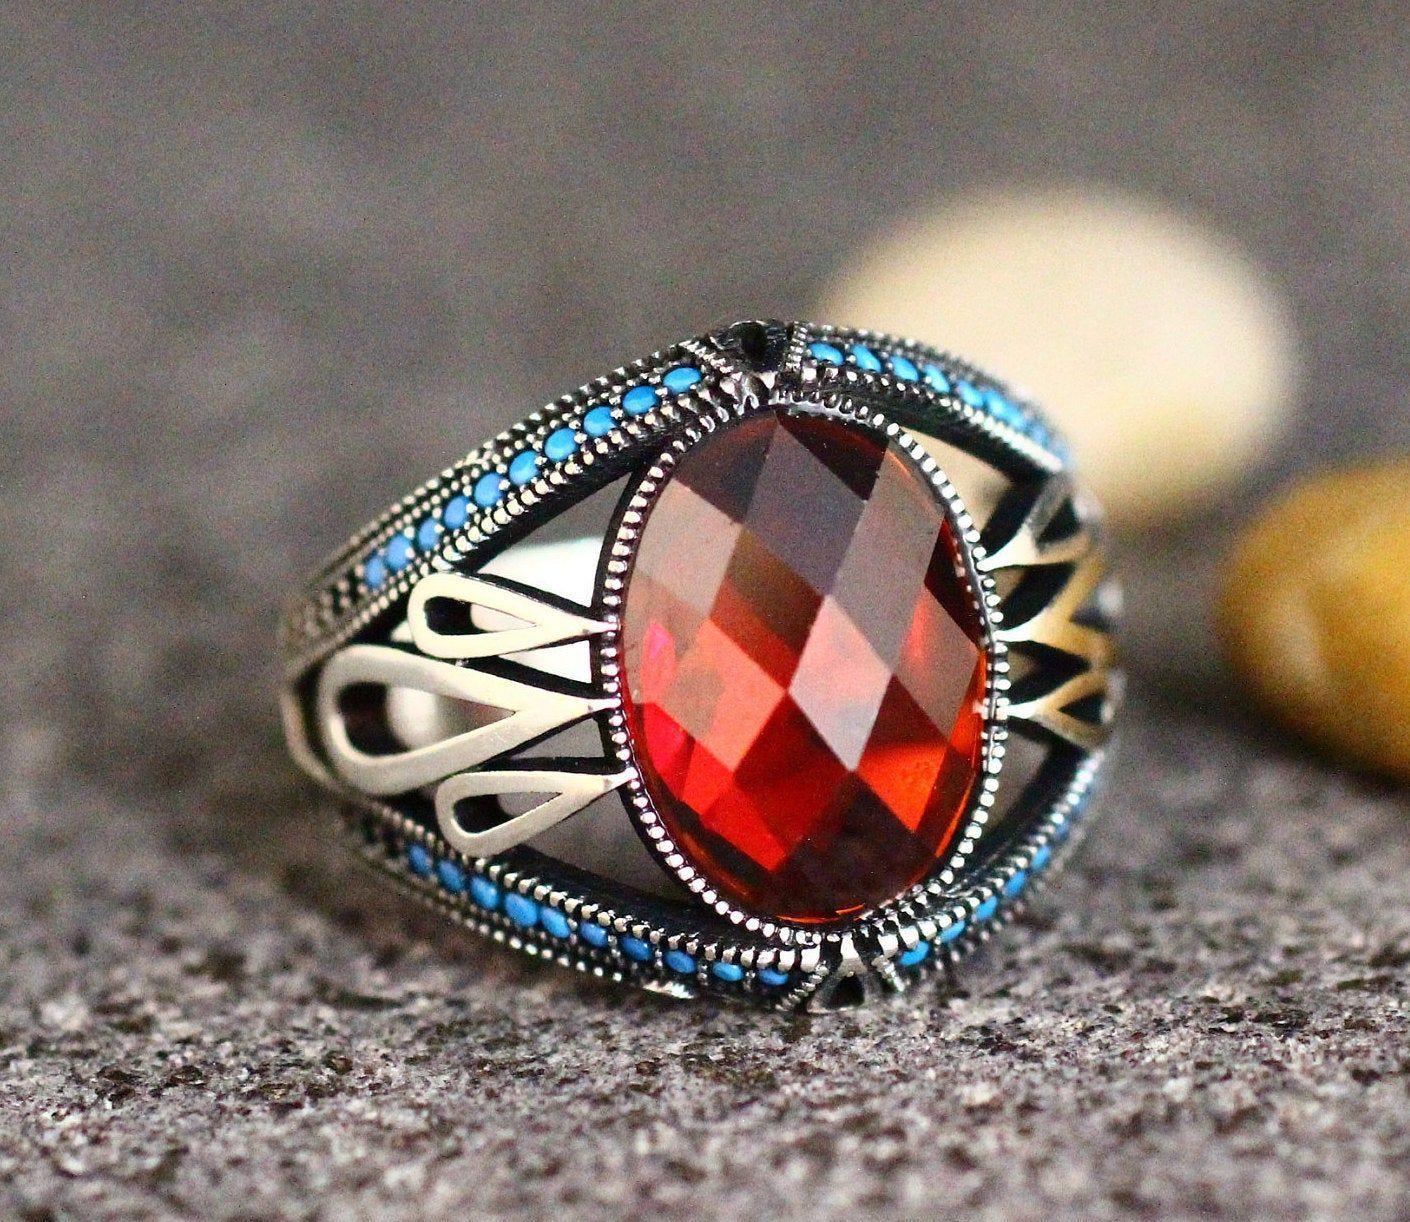 Sterling Silver 925 Men's Ring, Ruby Men Ring , Silver Men's Ring, Gift for Him, Ottoman Silver 925 Men Ring, Turkish Handmade Men Ring,Ruby -   - #beautifuljewelry #Gift #glassesforyourfaceshape #Handmade #Men #mens #Ottoman #ring #RingRuby #Ruby #Silver #sterling #Turkish